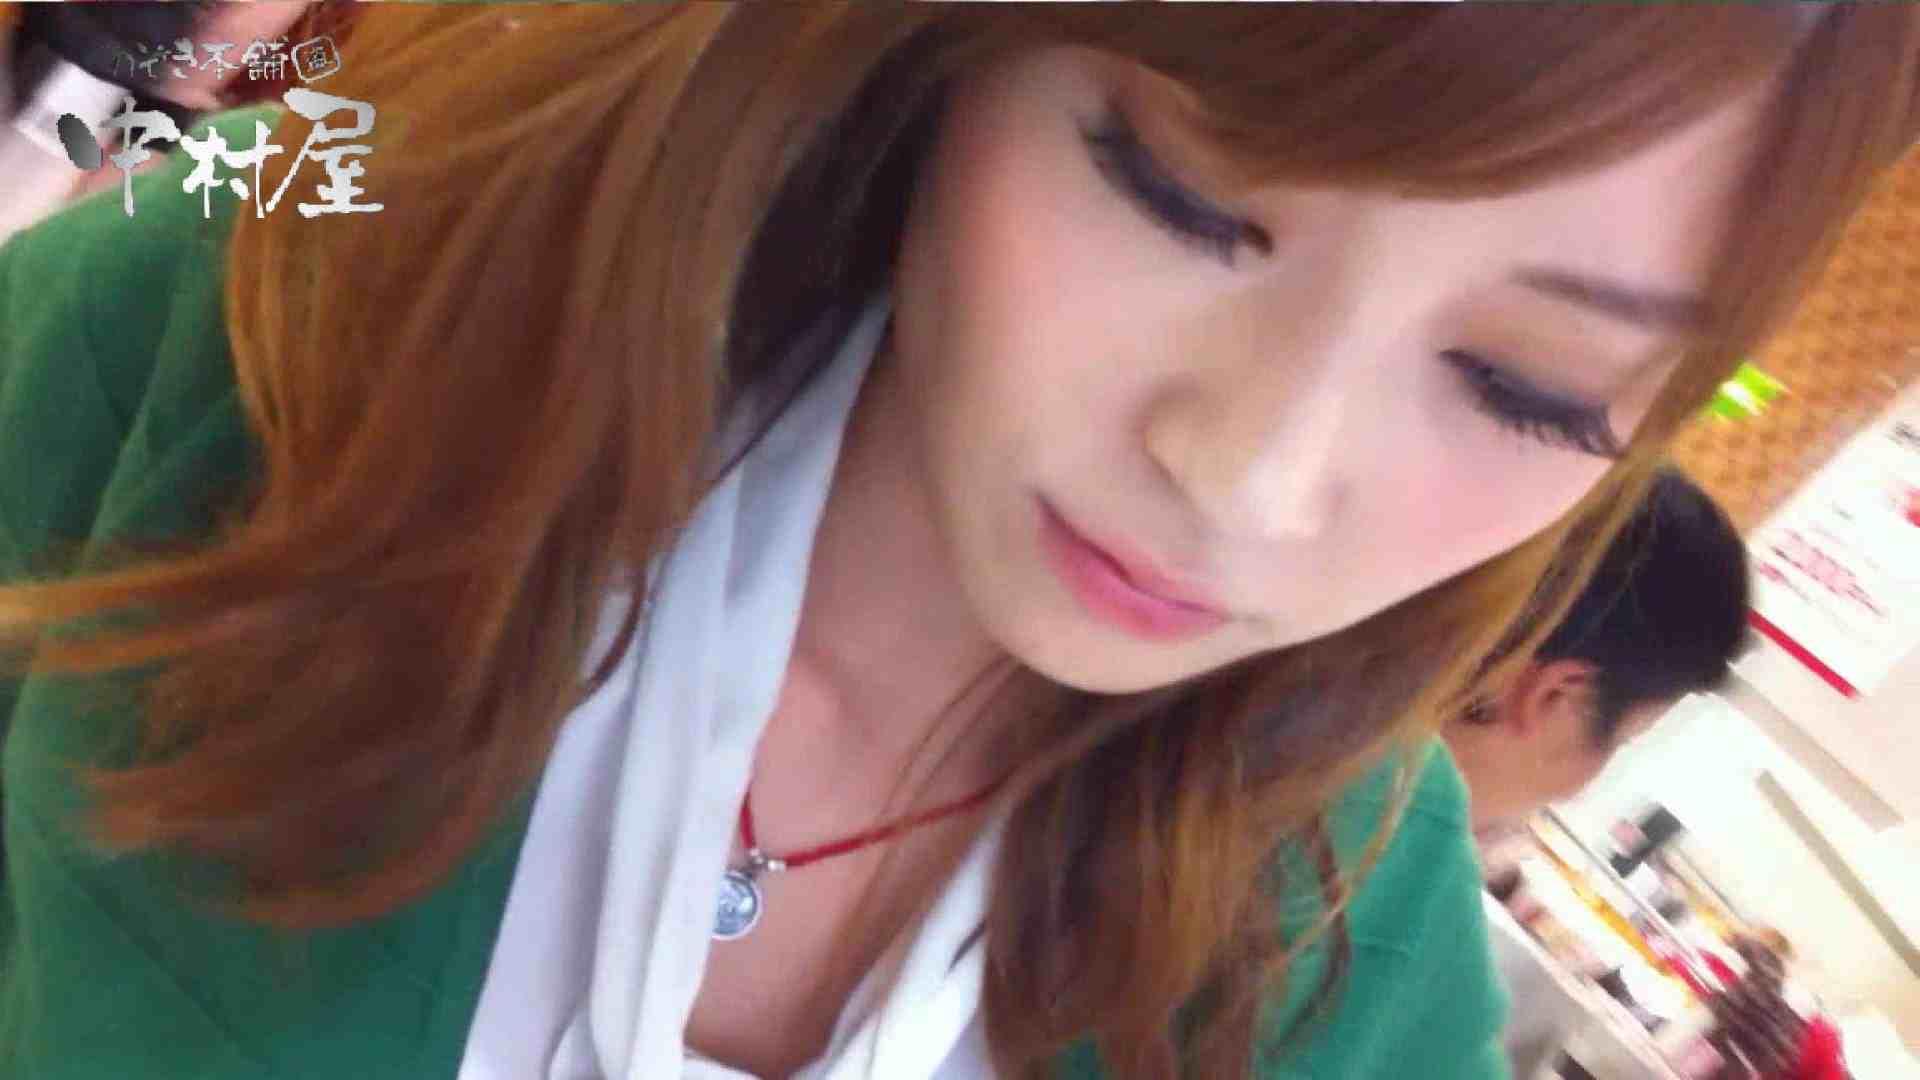 vol.48可愛いカリスマ店員胸チラ&パンチラ アニメ声の店員さん 胸チラ  96Pix 83